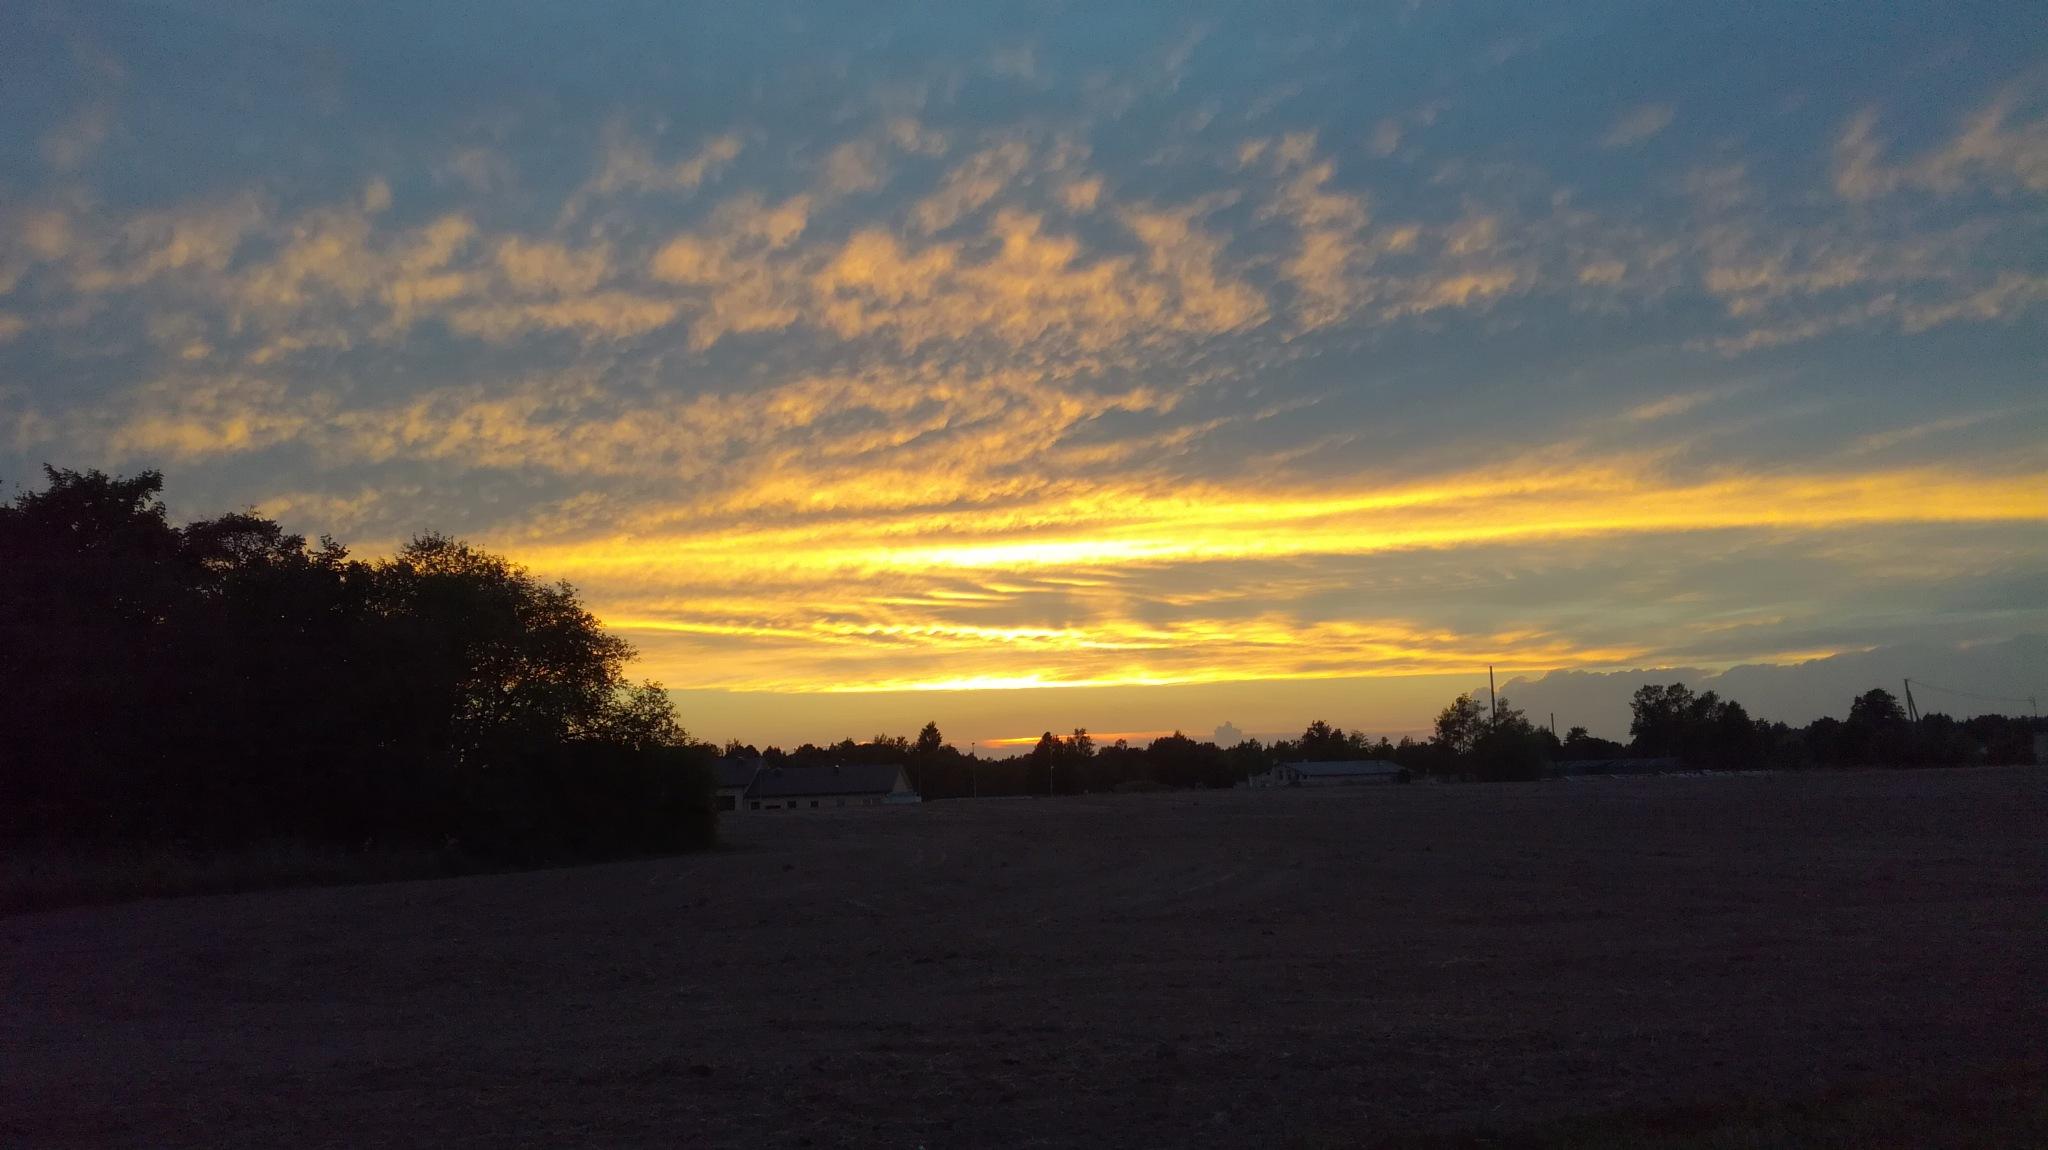 Sky after sunset by uzkuraitiene62